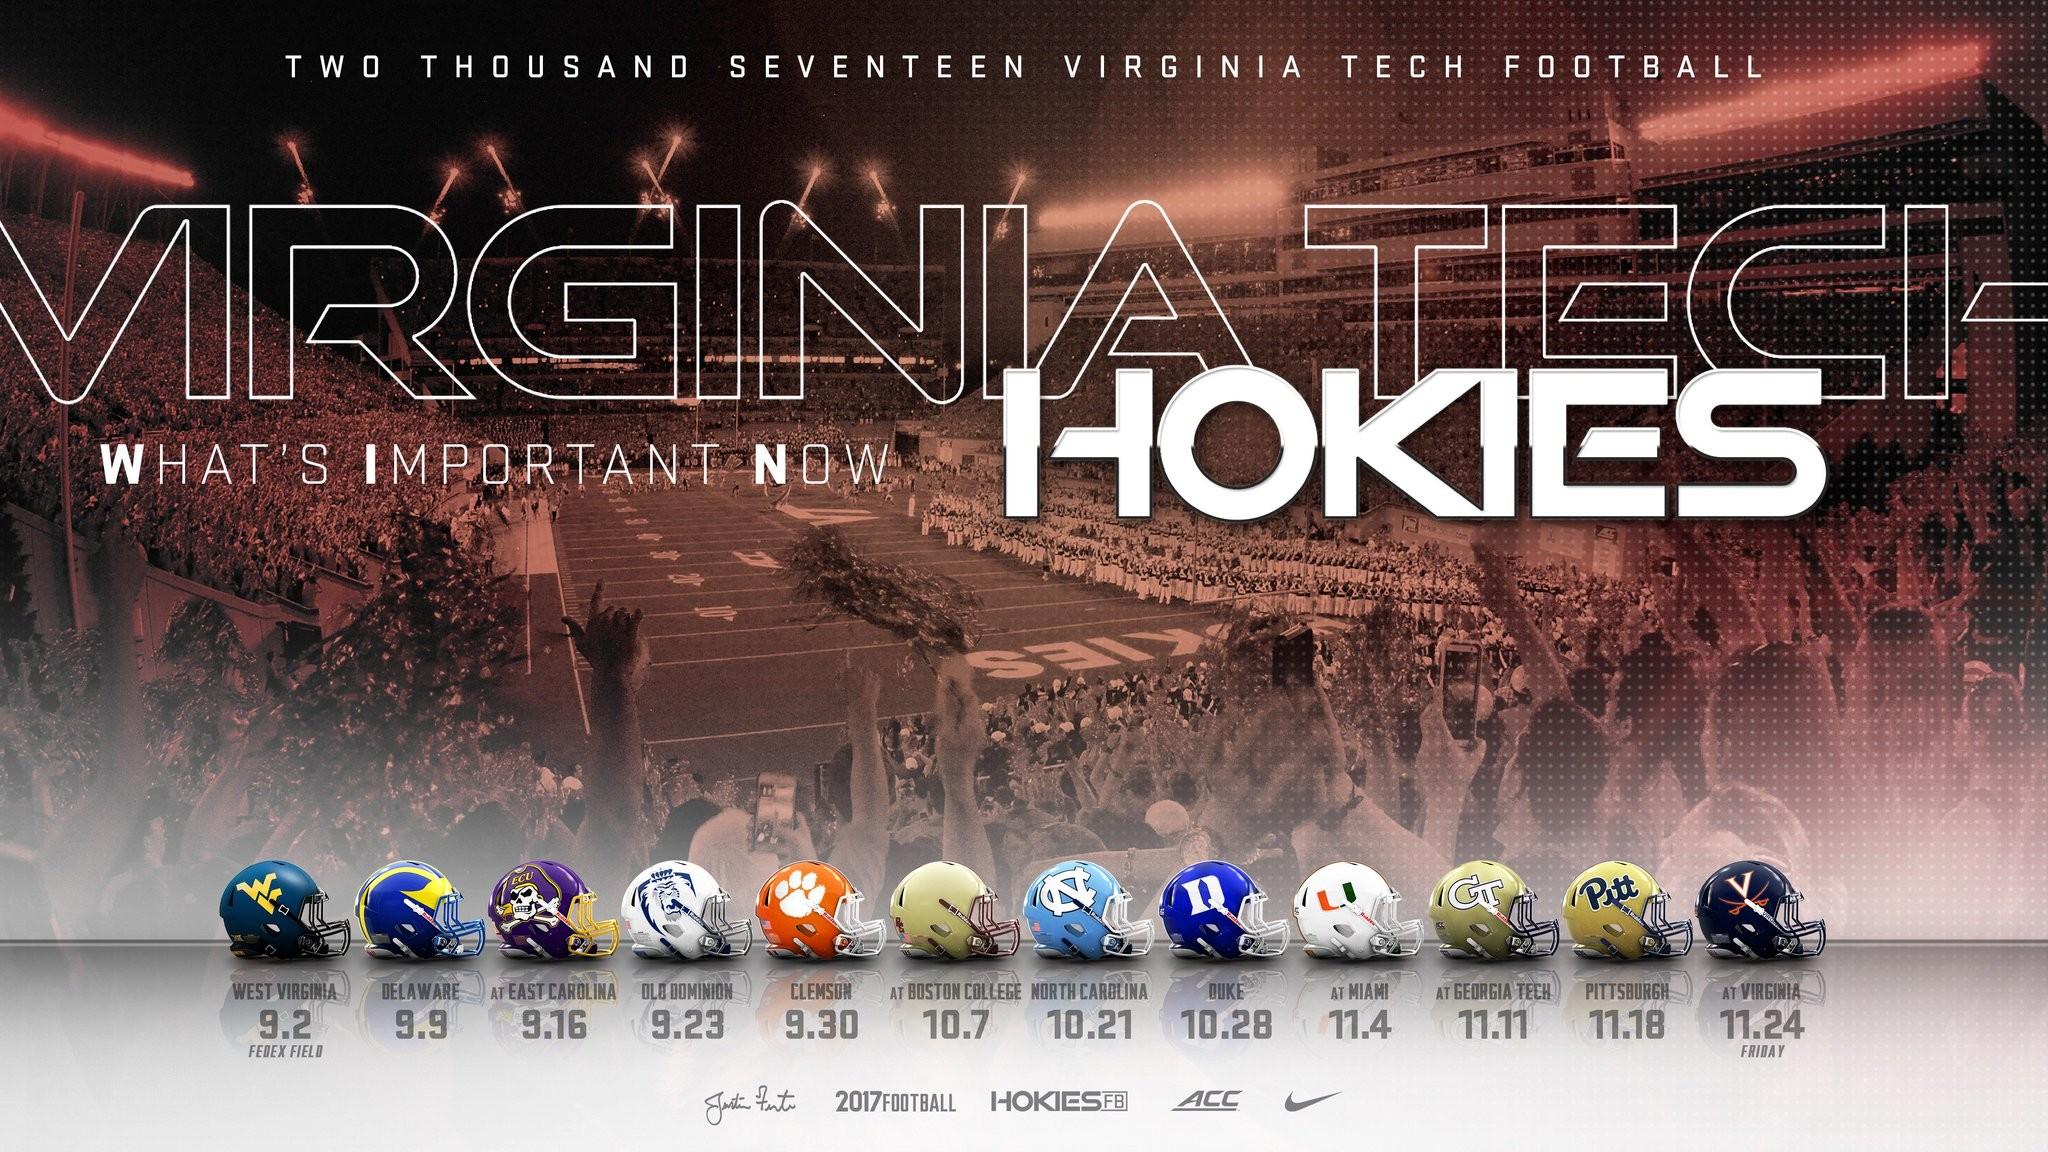 Oklahoma Sooners Wallpaper For Iphone Virginia Tech Desktop Wallpaper 59 Images